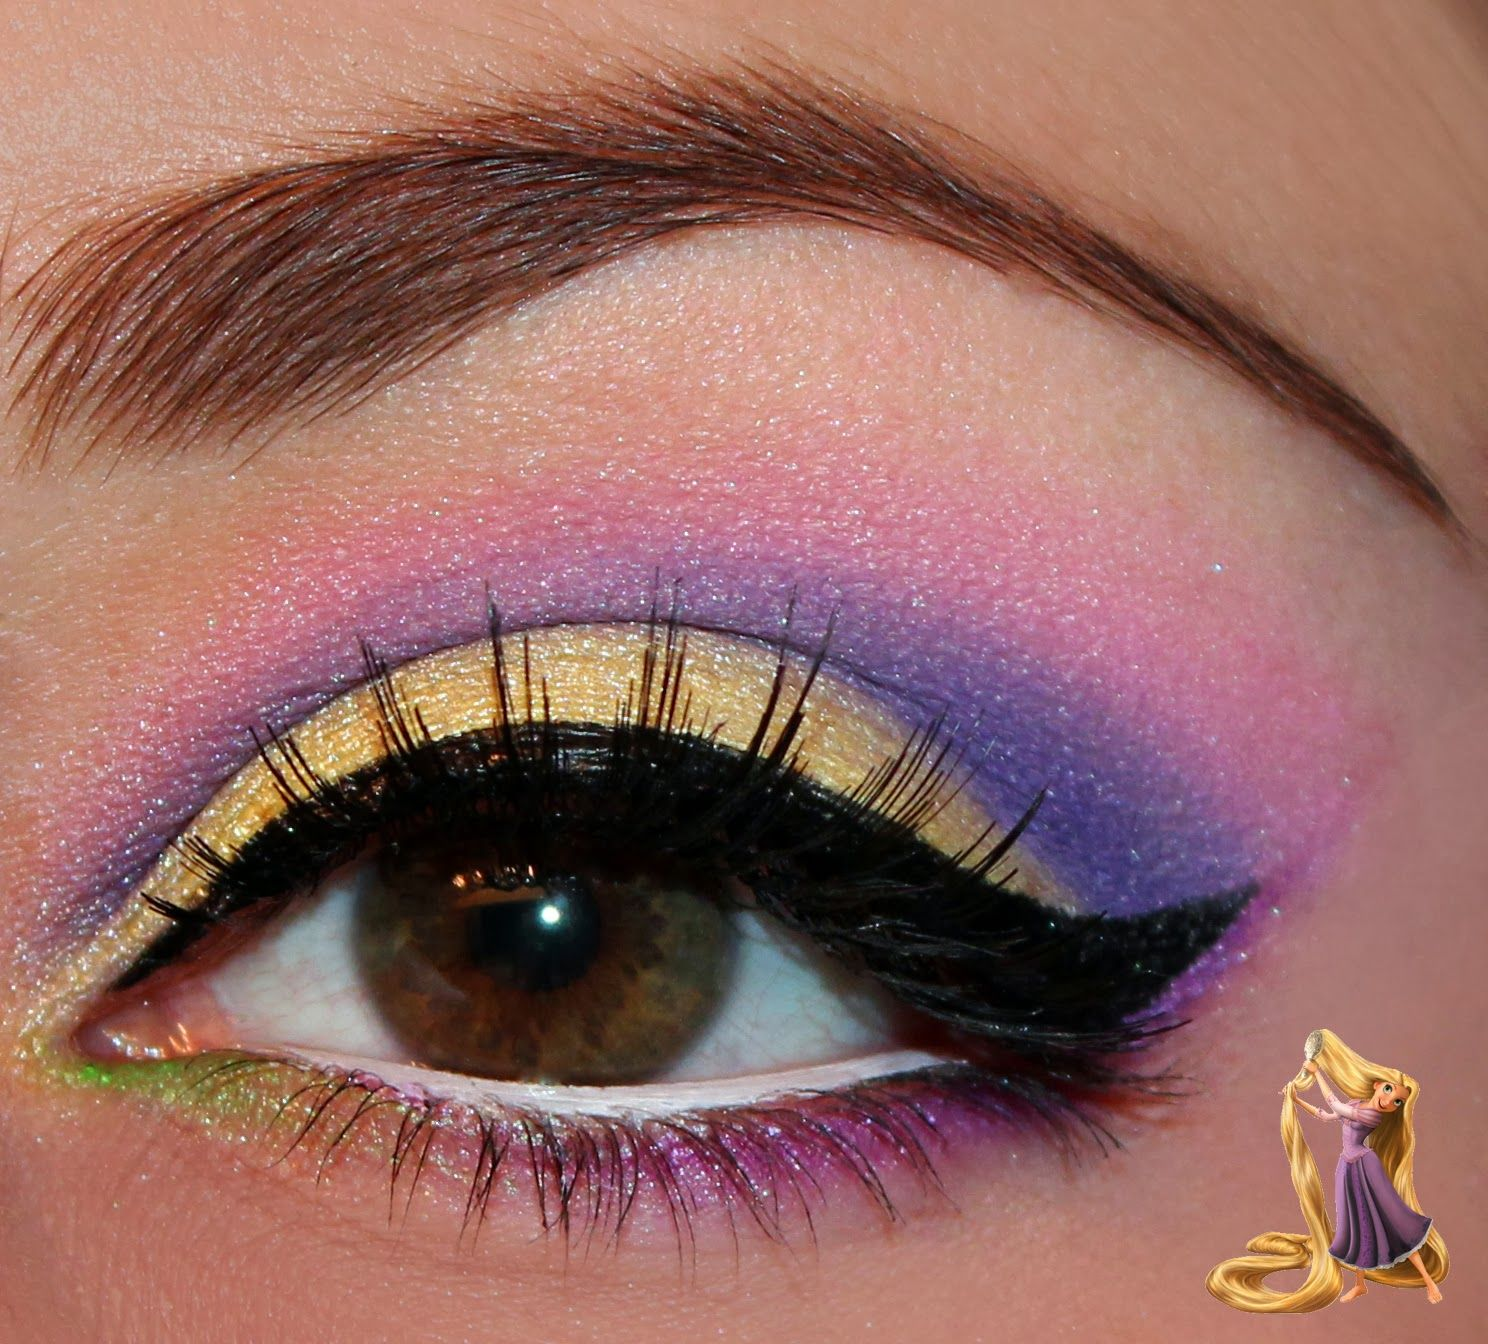 Luhivy S Favorite Things Disney Makeup Disney Inspired Makeup Disney Princess Makeup